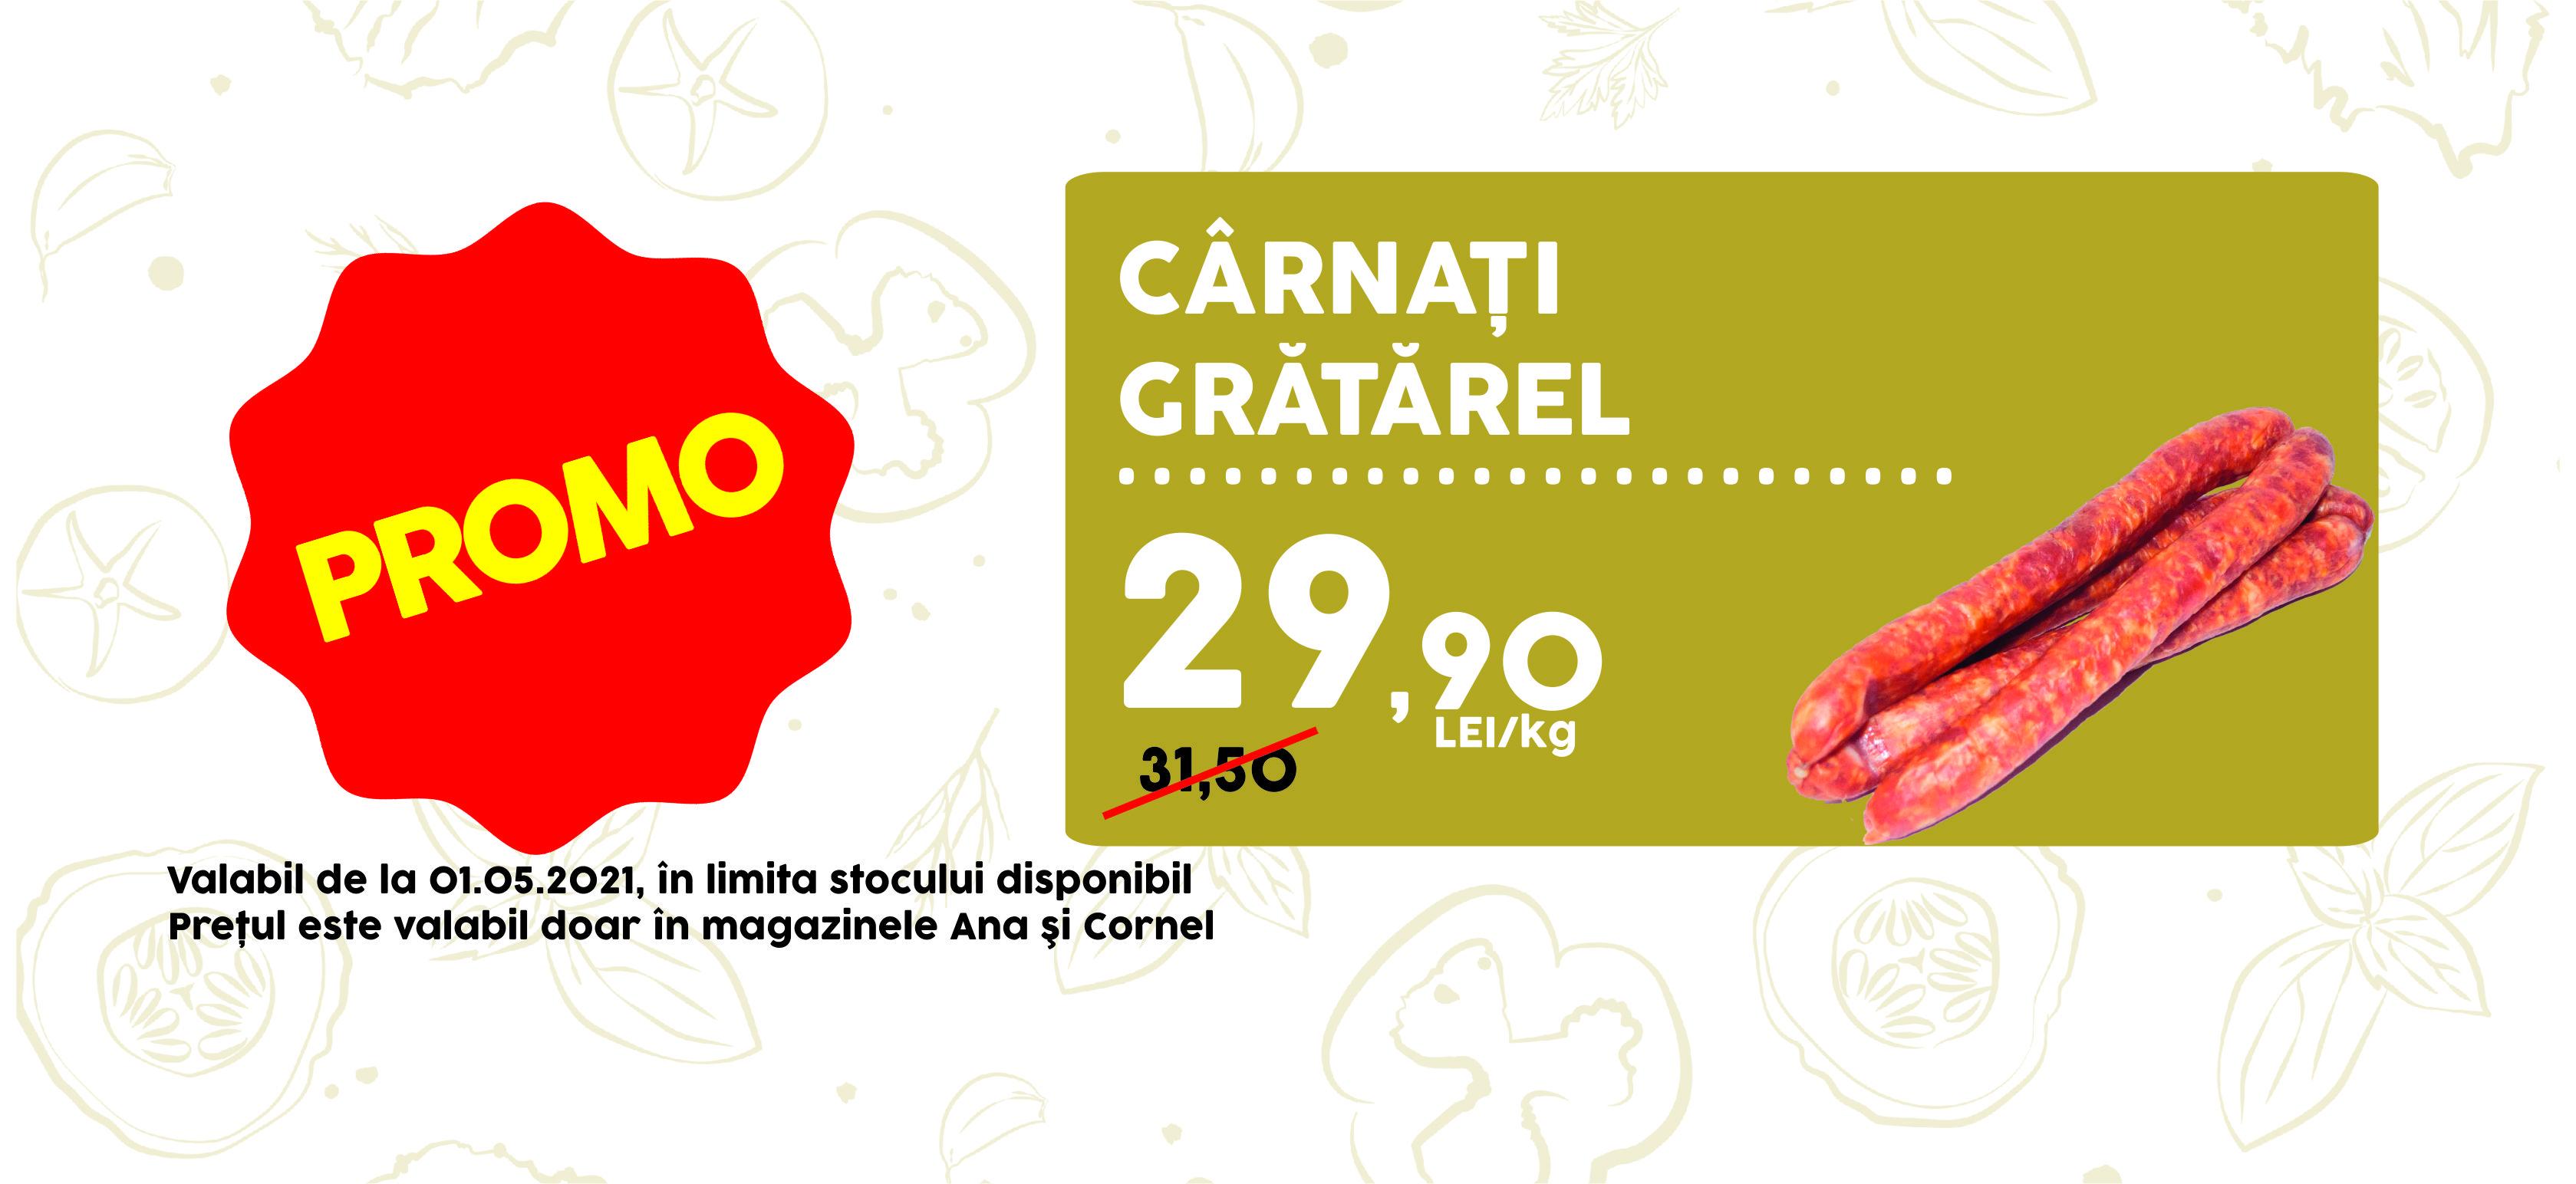 CARNATI-GRATAREL-MAI